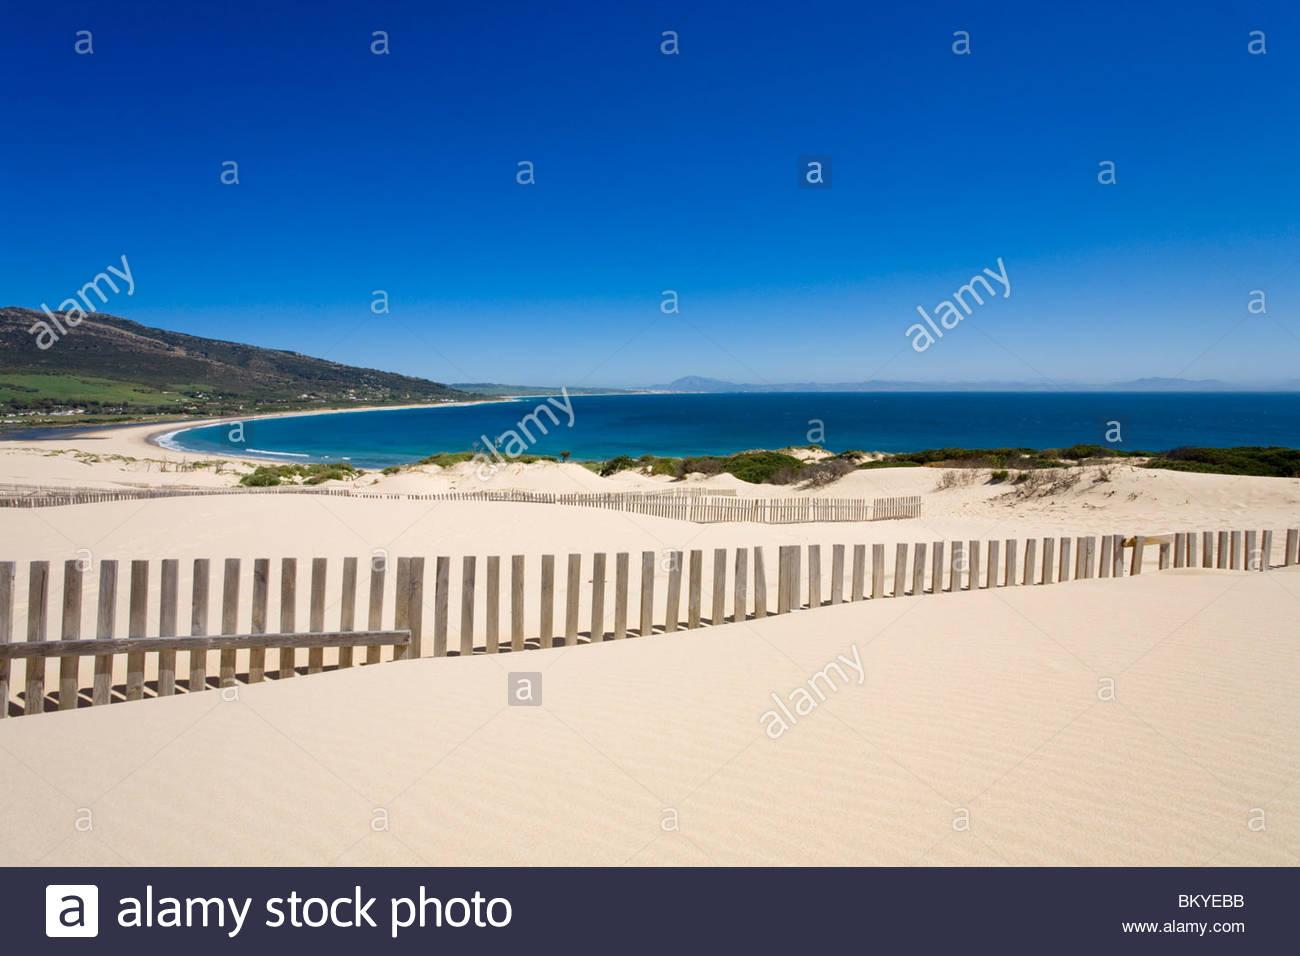 The big dunes near Tarifa, Africa on the horizont, Andalucia, Province Cadiz, Spain - Stock Image